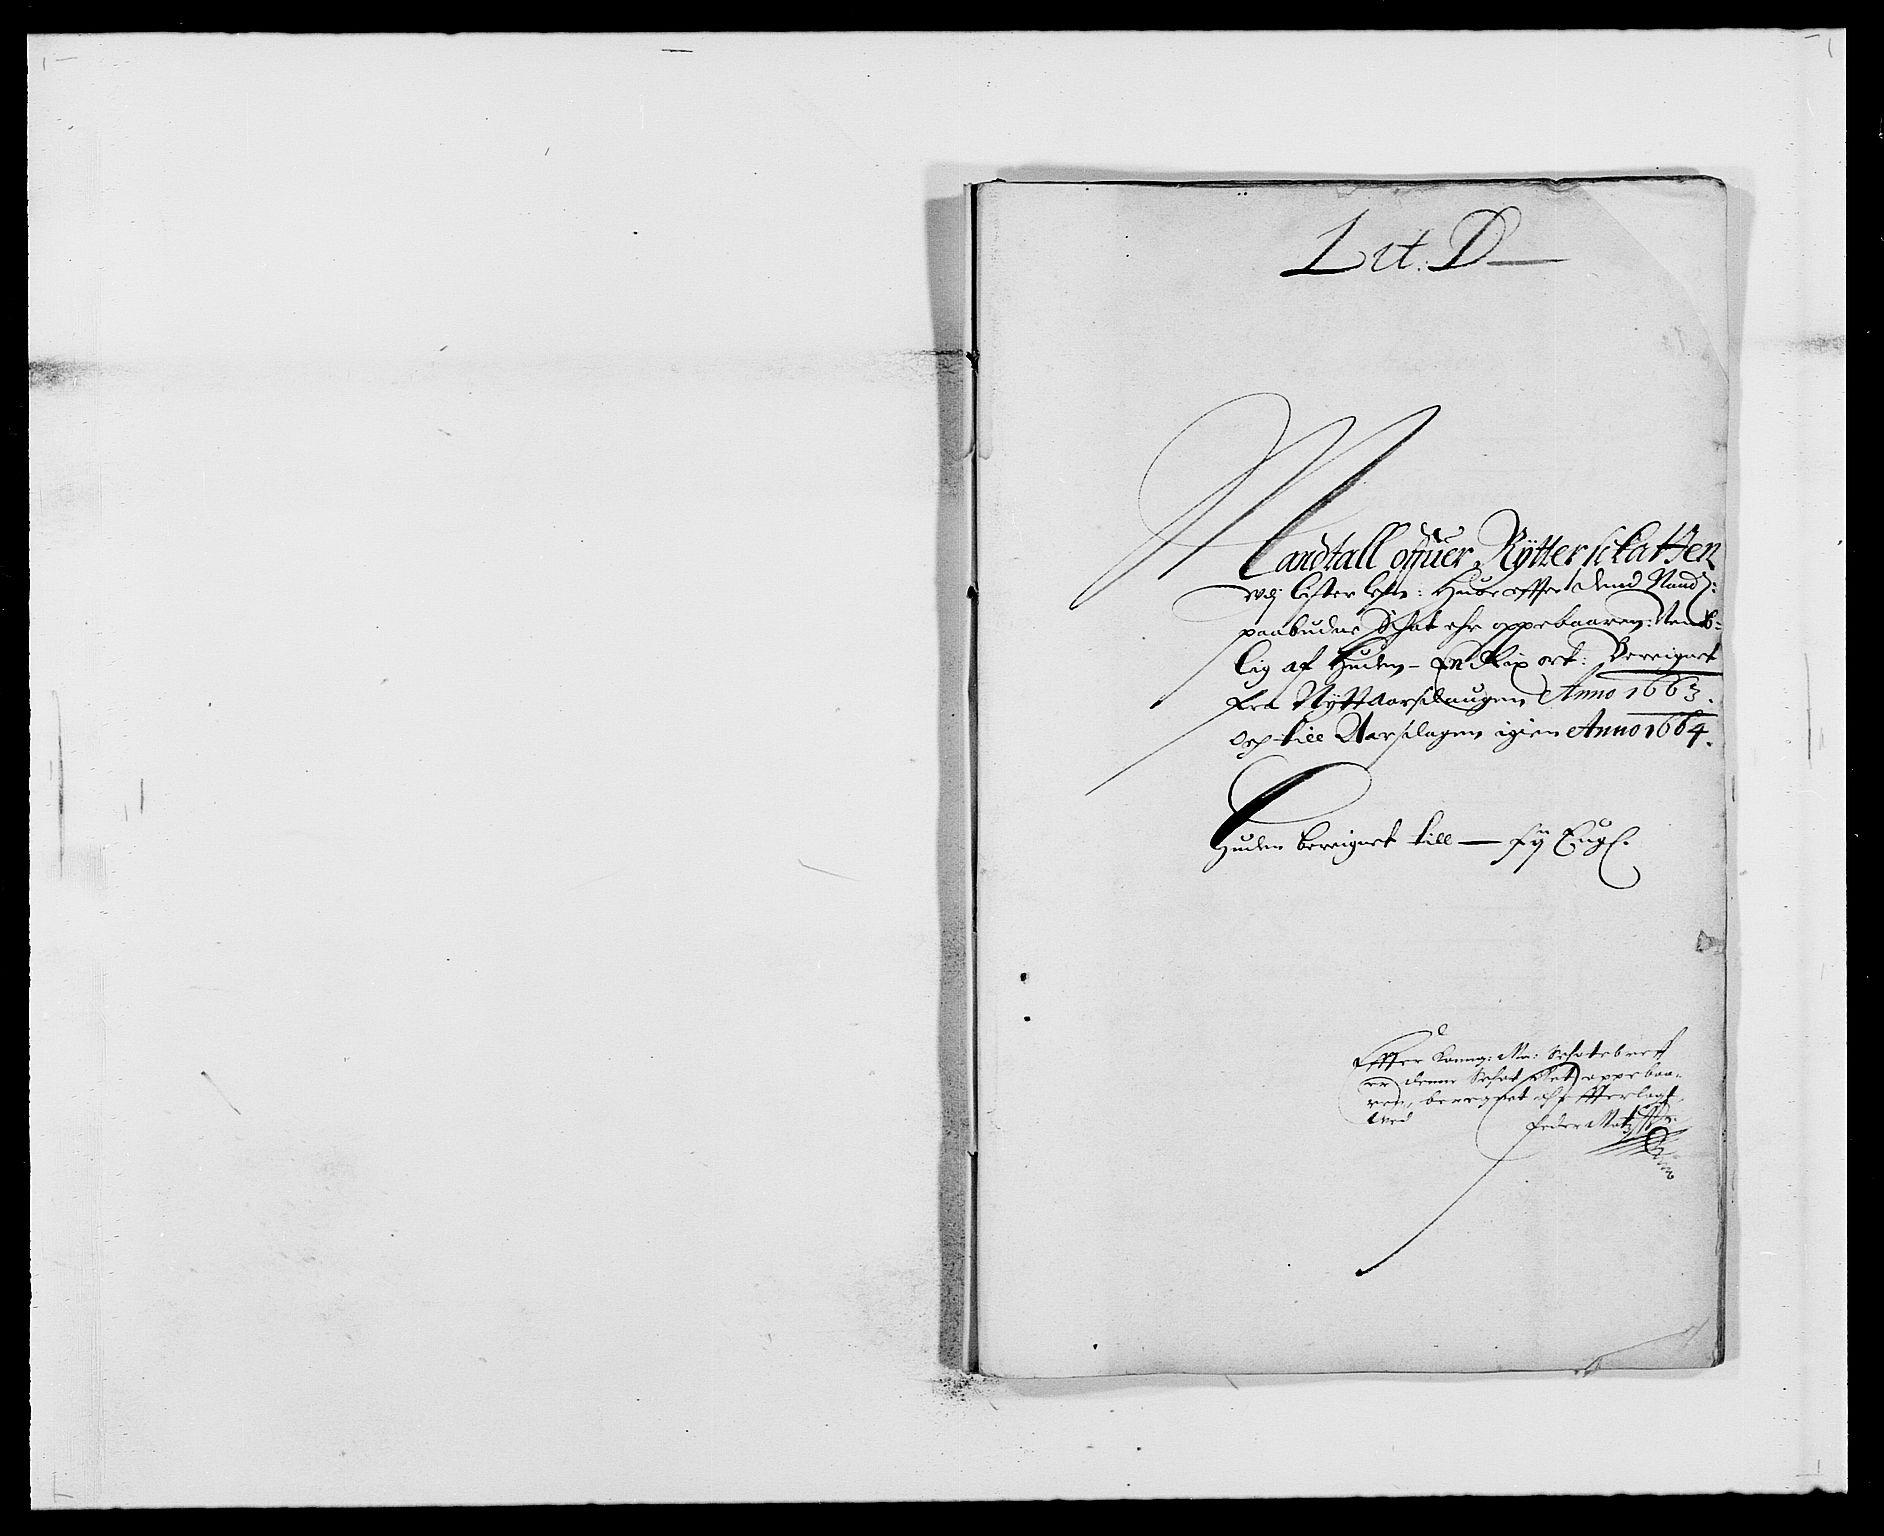 RA, Rentekammeret inntil 1814, Reviderte regnskaper, Fogderegnskap, R41/L2523: Fogderegnskap Lista, 1663-1664, s. 51